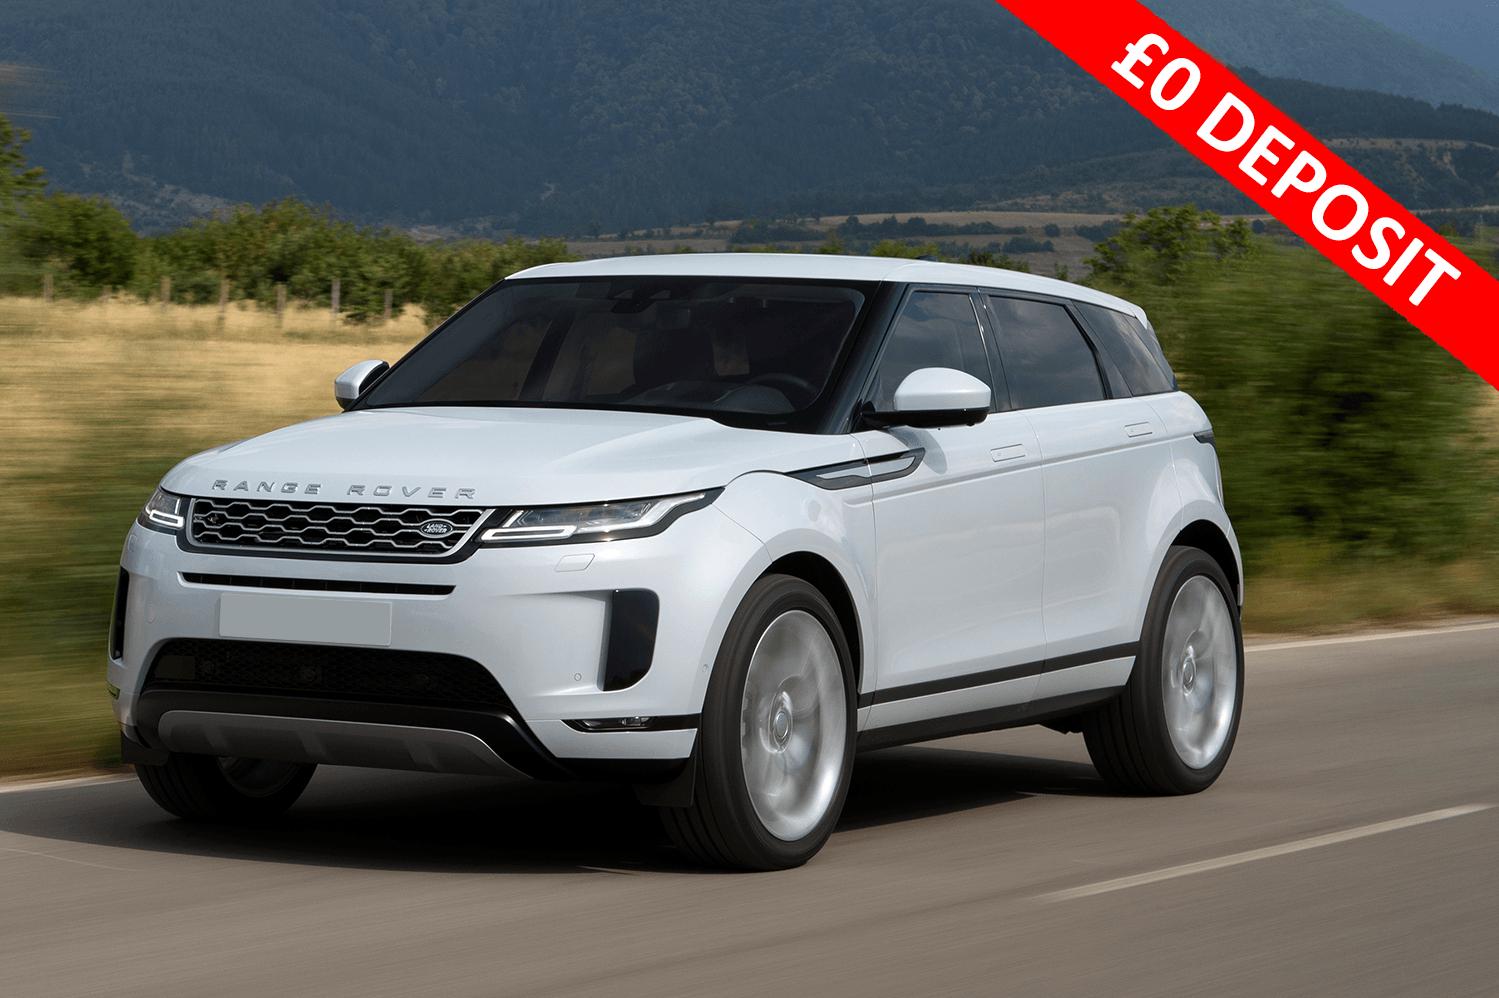 £0 Deposit Offer - New Model Range Rover Evoque 2.0 D150 5dr 2WD - 48x £363.99/month + £234 documentation fee = £17,705.52 @ Hippo Leasing